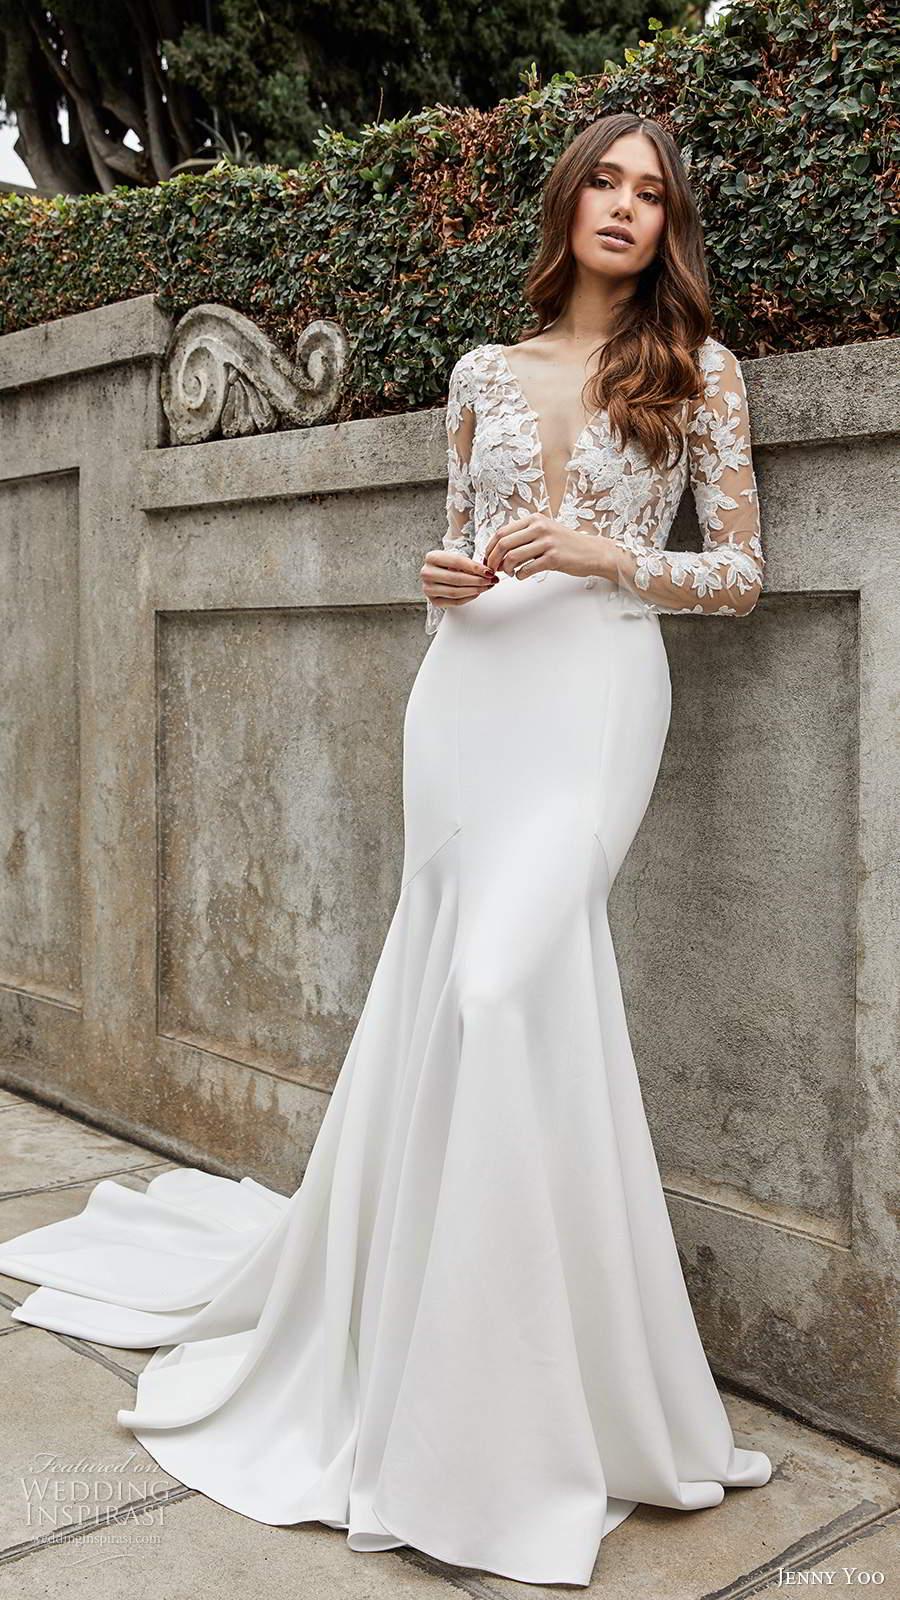 jenny yoo spring 2020 bridal illusion long sleeves plunging v neckline sheer embellished bodice clean skirt fit flare mermaid wedding dress chapel train (8) mv